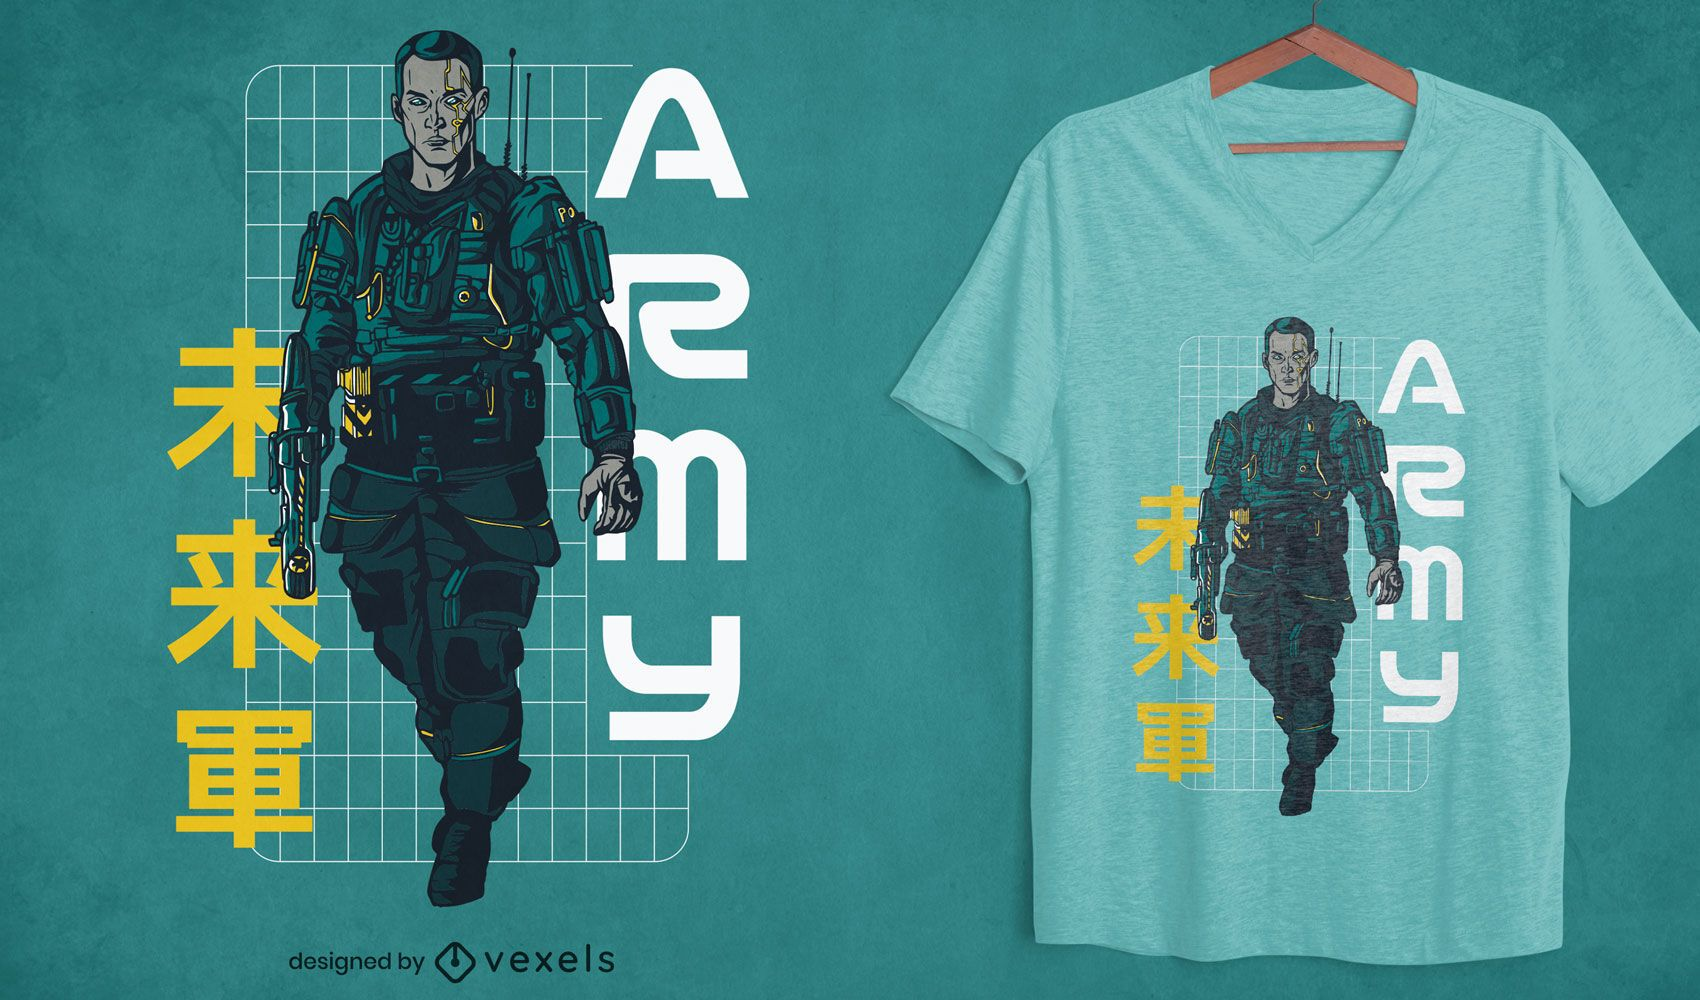 Design de camiseta futurista do xerife